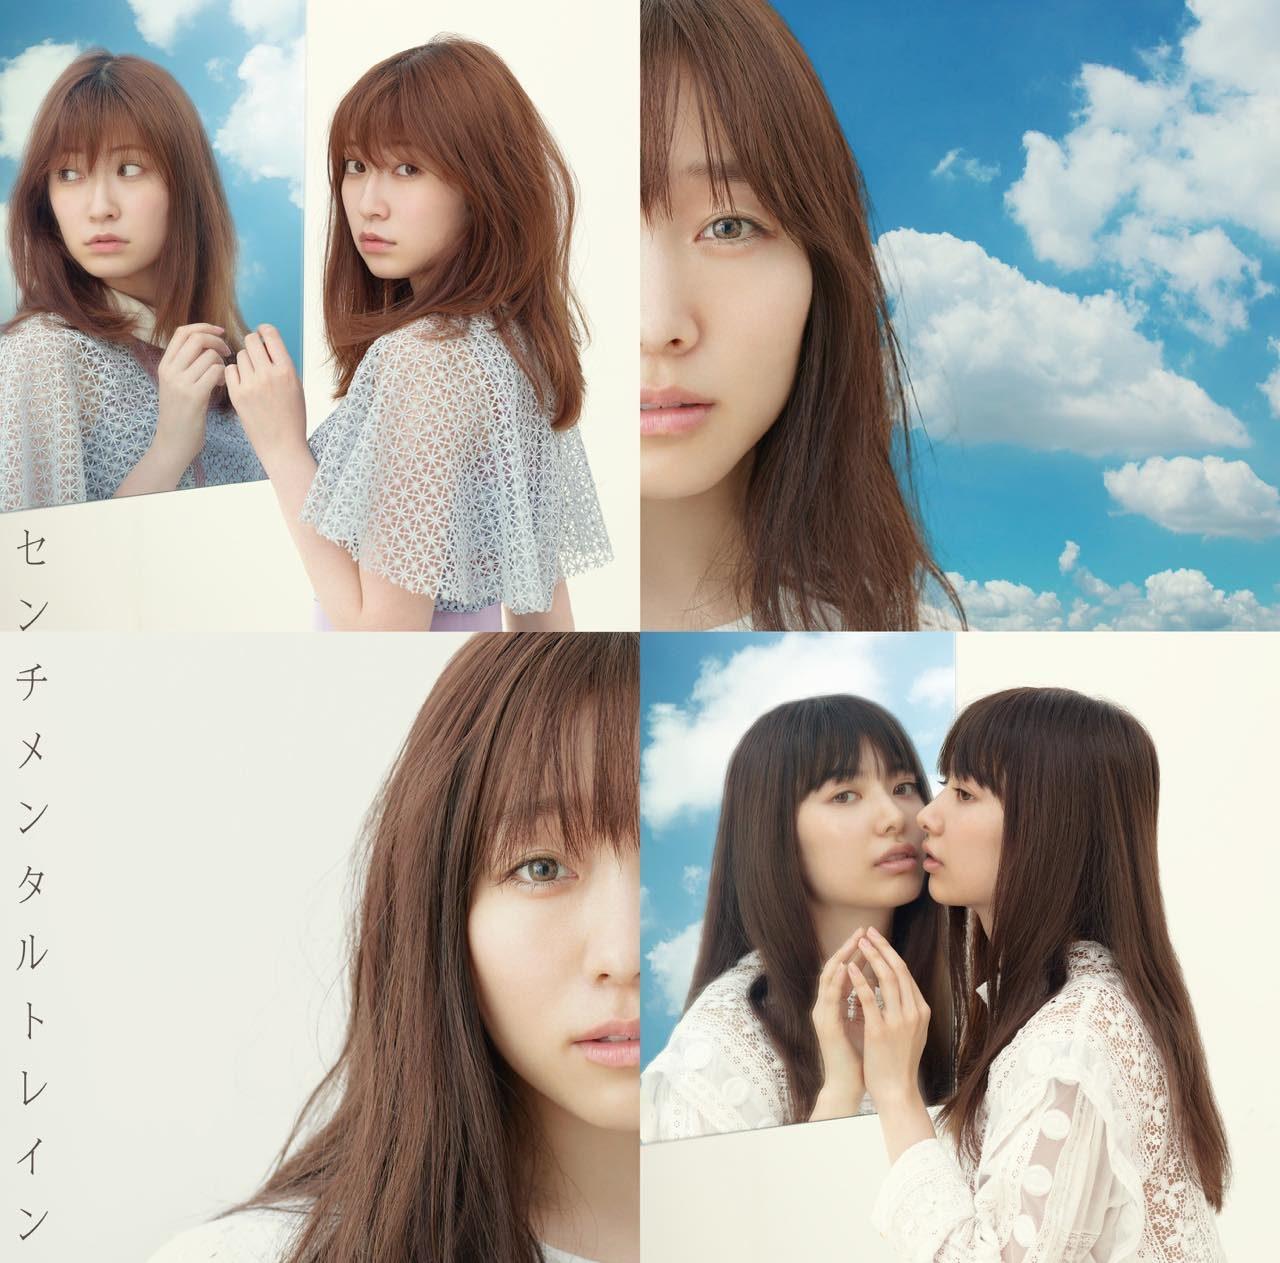 20181001.2156.01 AKB48 - Sentimental Train (Type A) cover 1.jpg